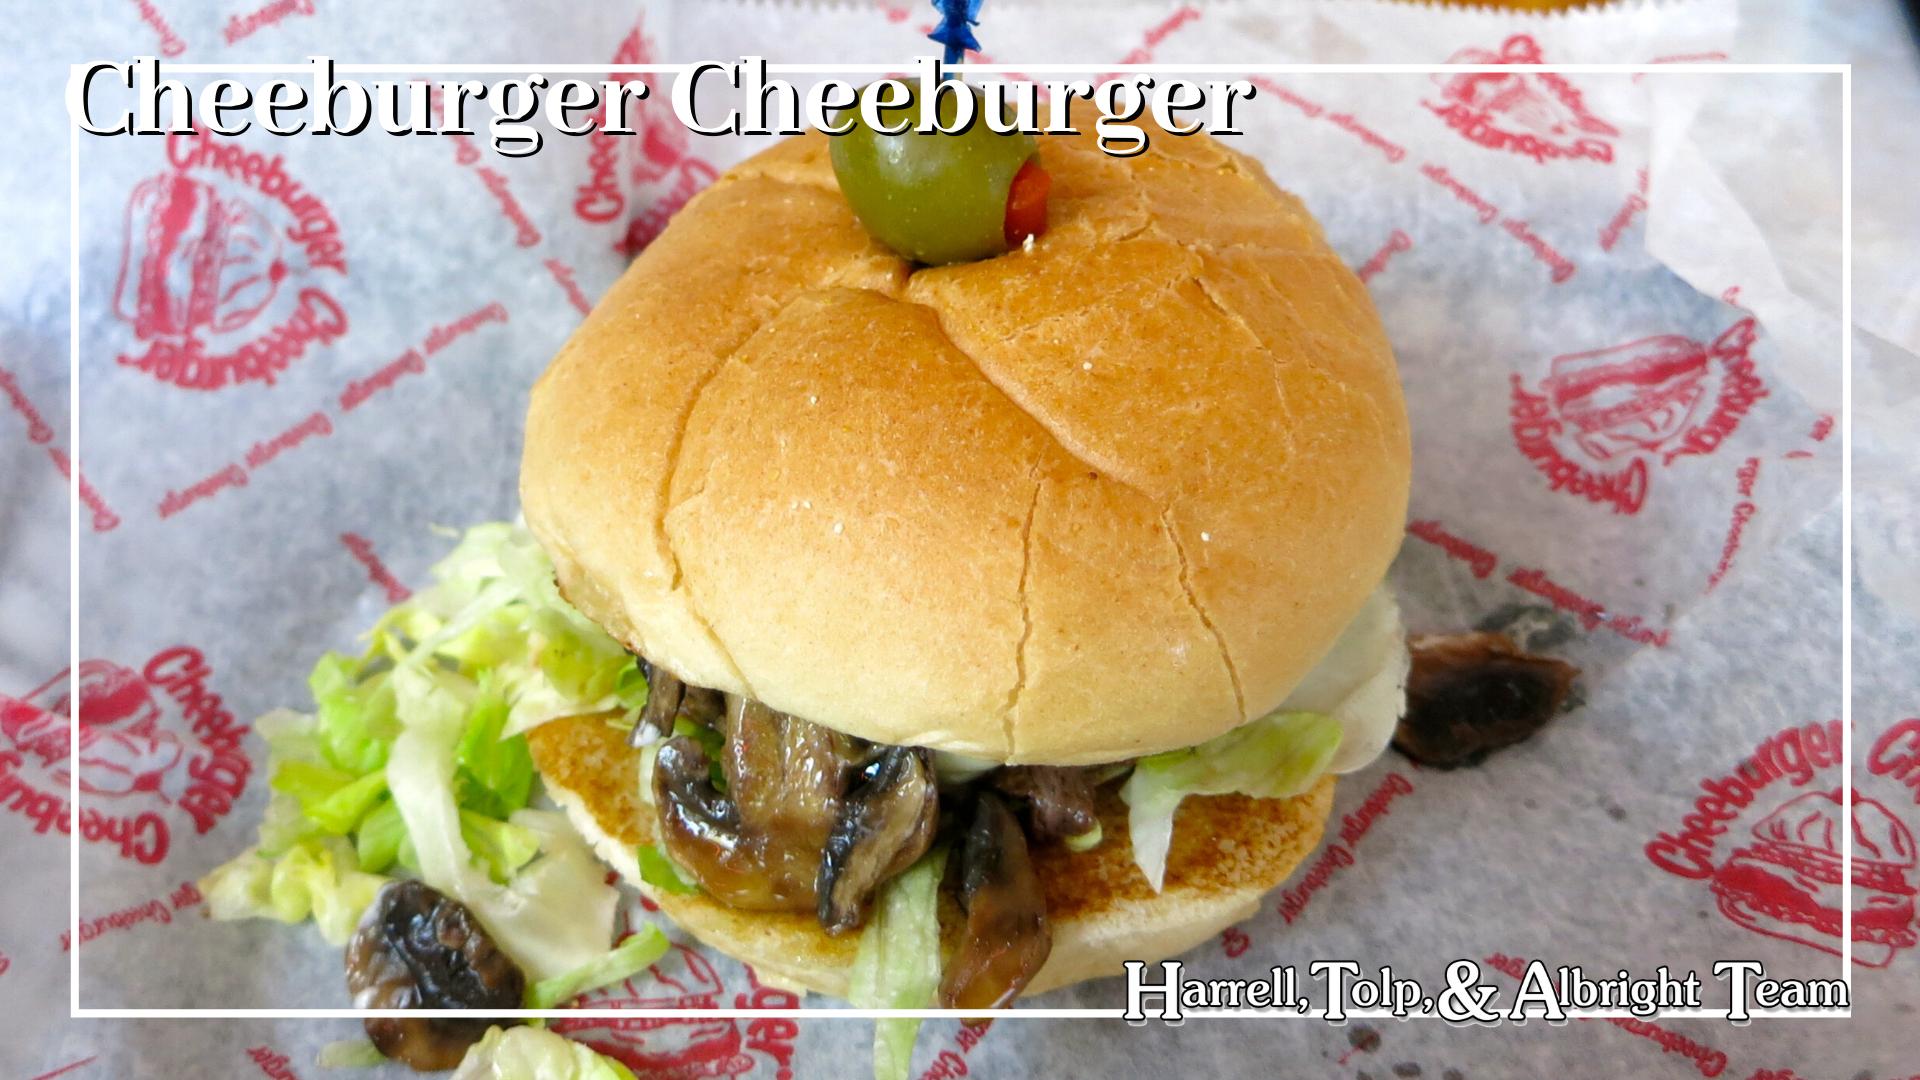 Cheeburger-Cheeburger